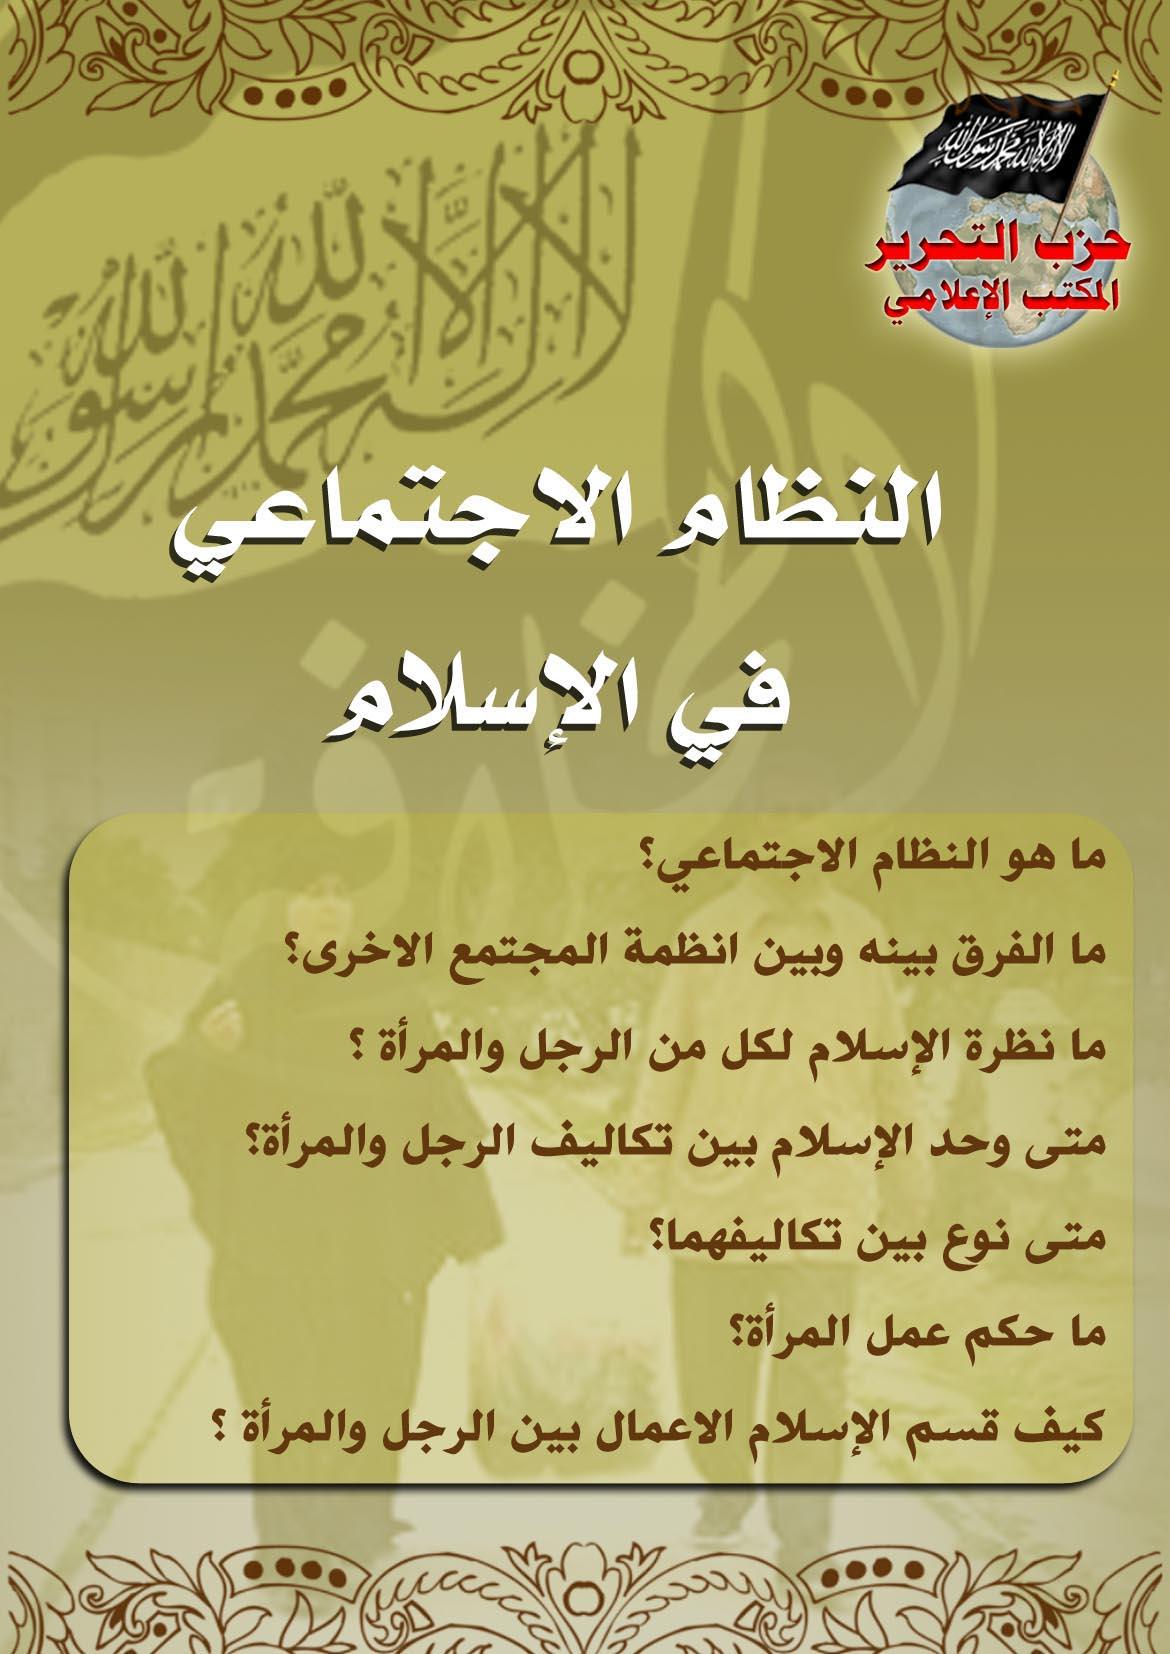 Al-Netham_Al-EGtima3i_01.jpg